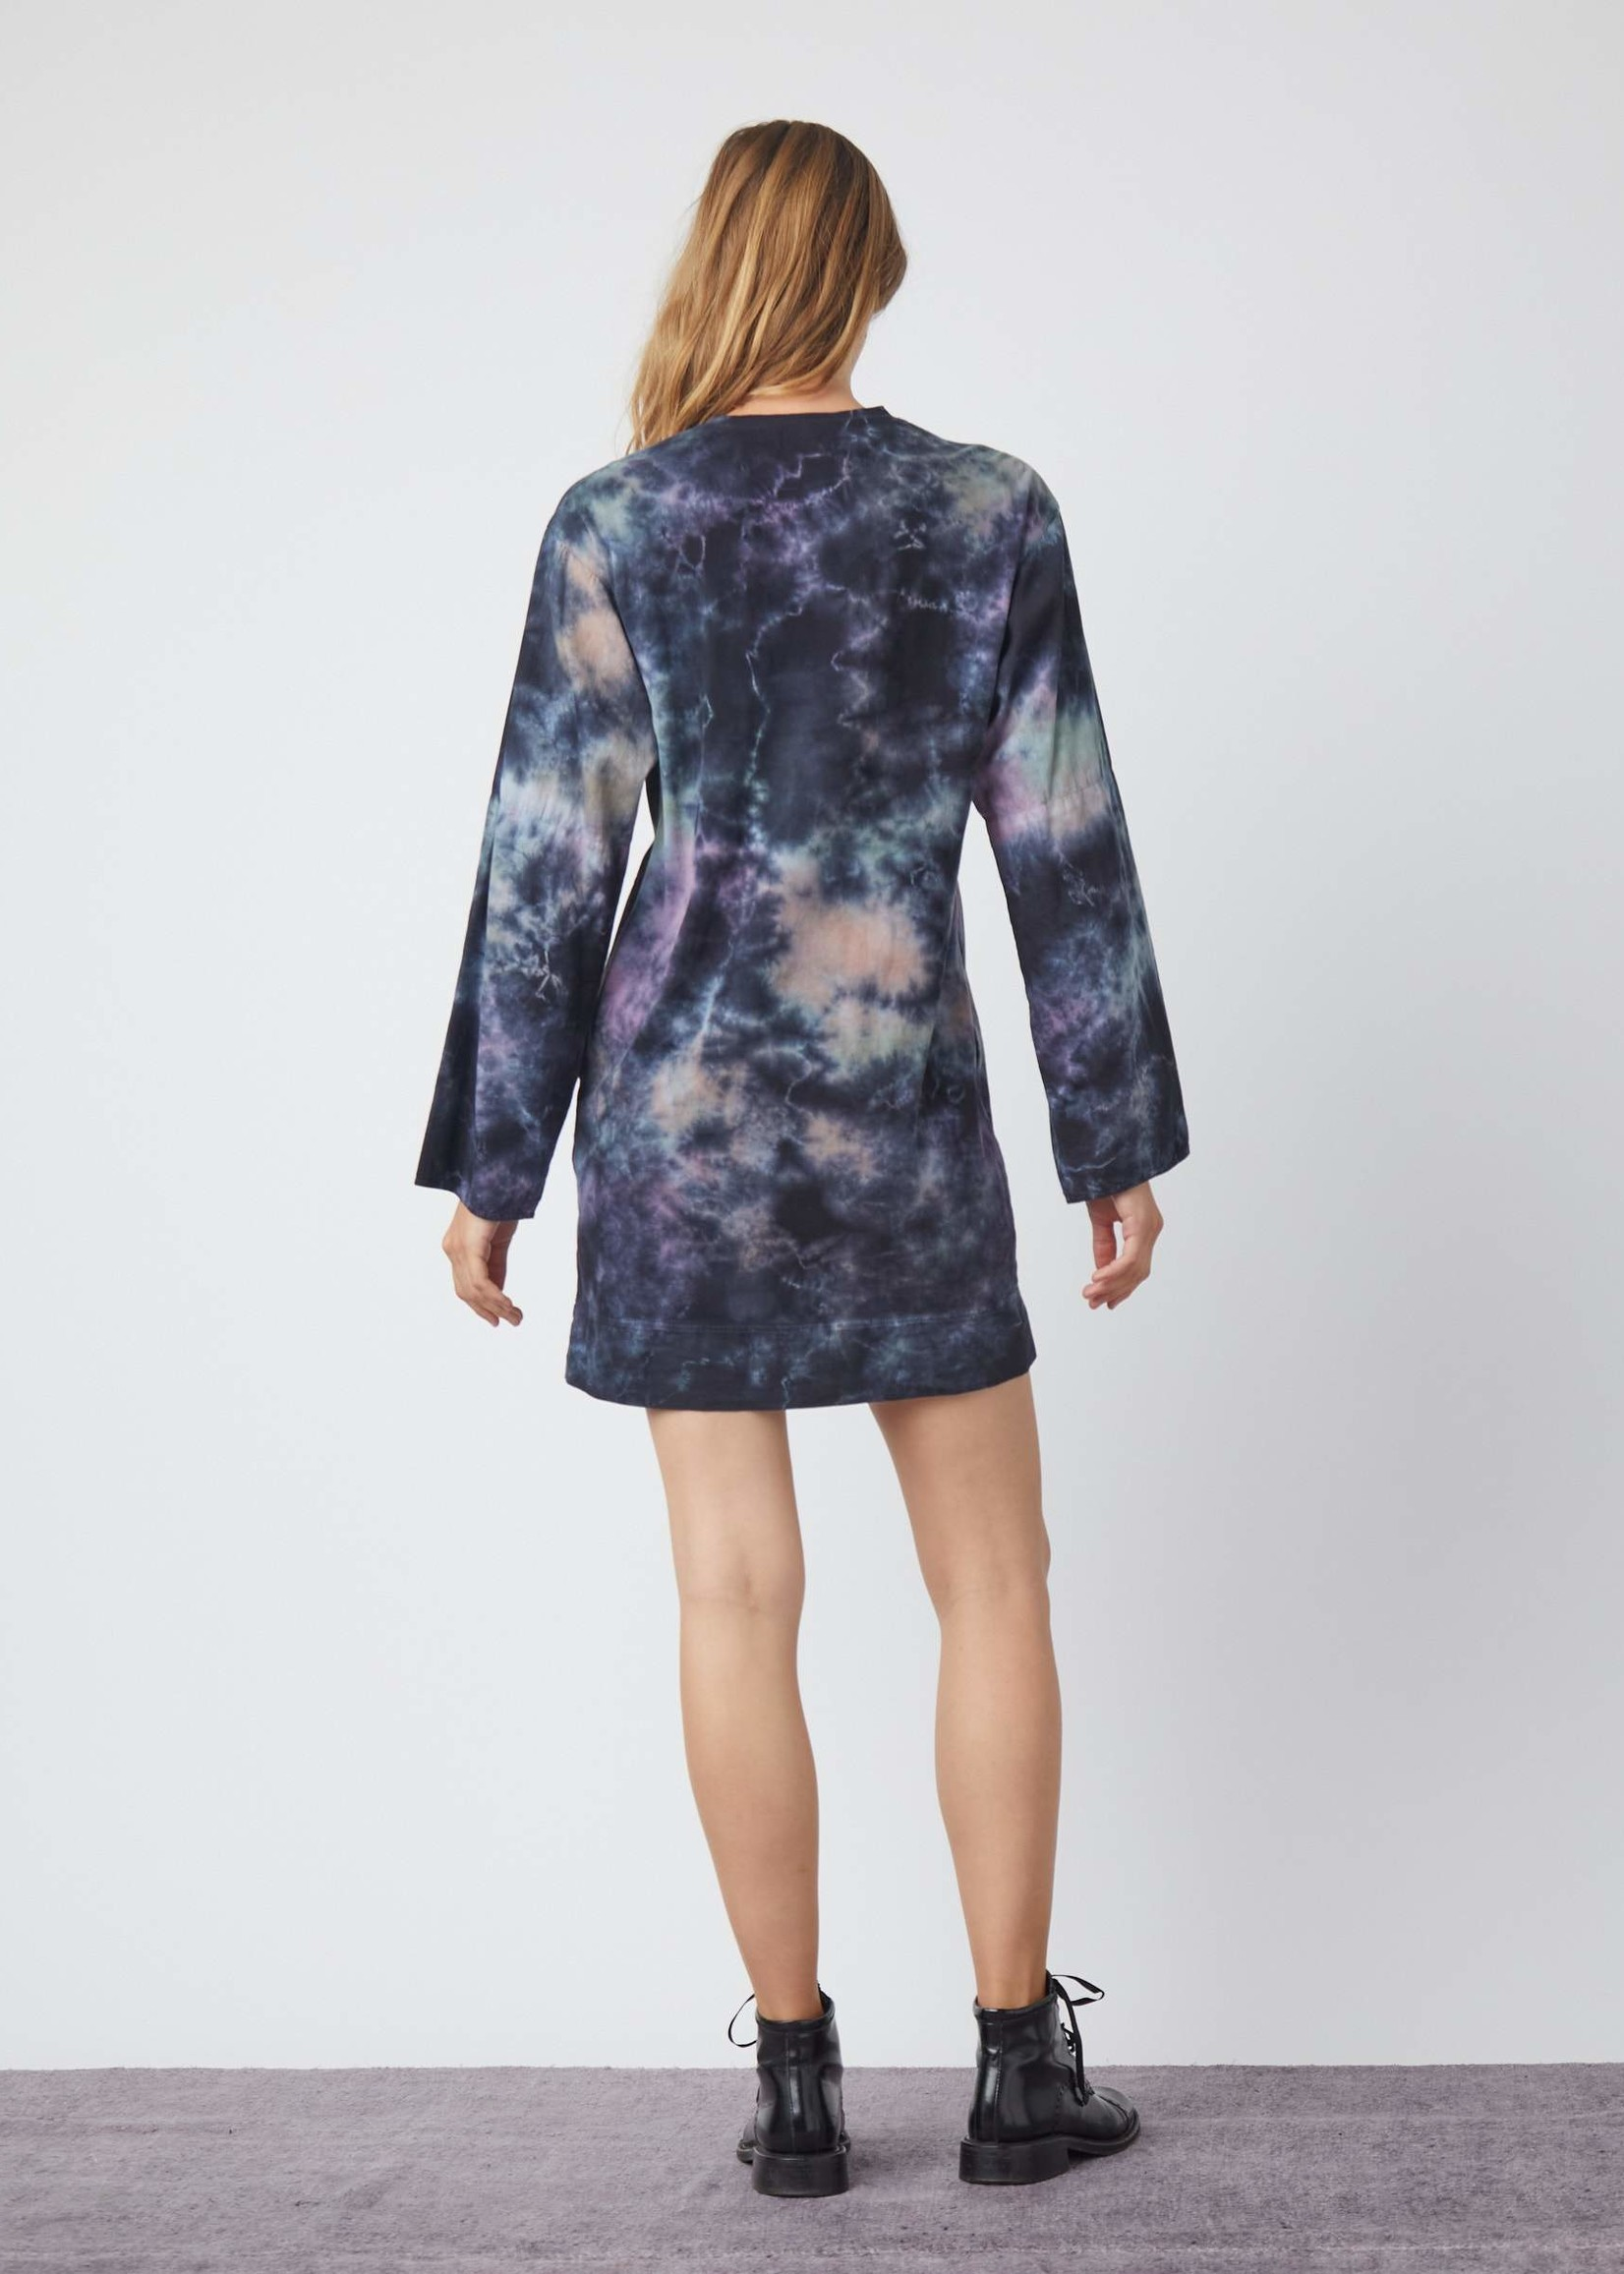 RAQUEL ALLEGRA PHOEBE SLEEVE SHIFT DRESS